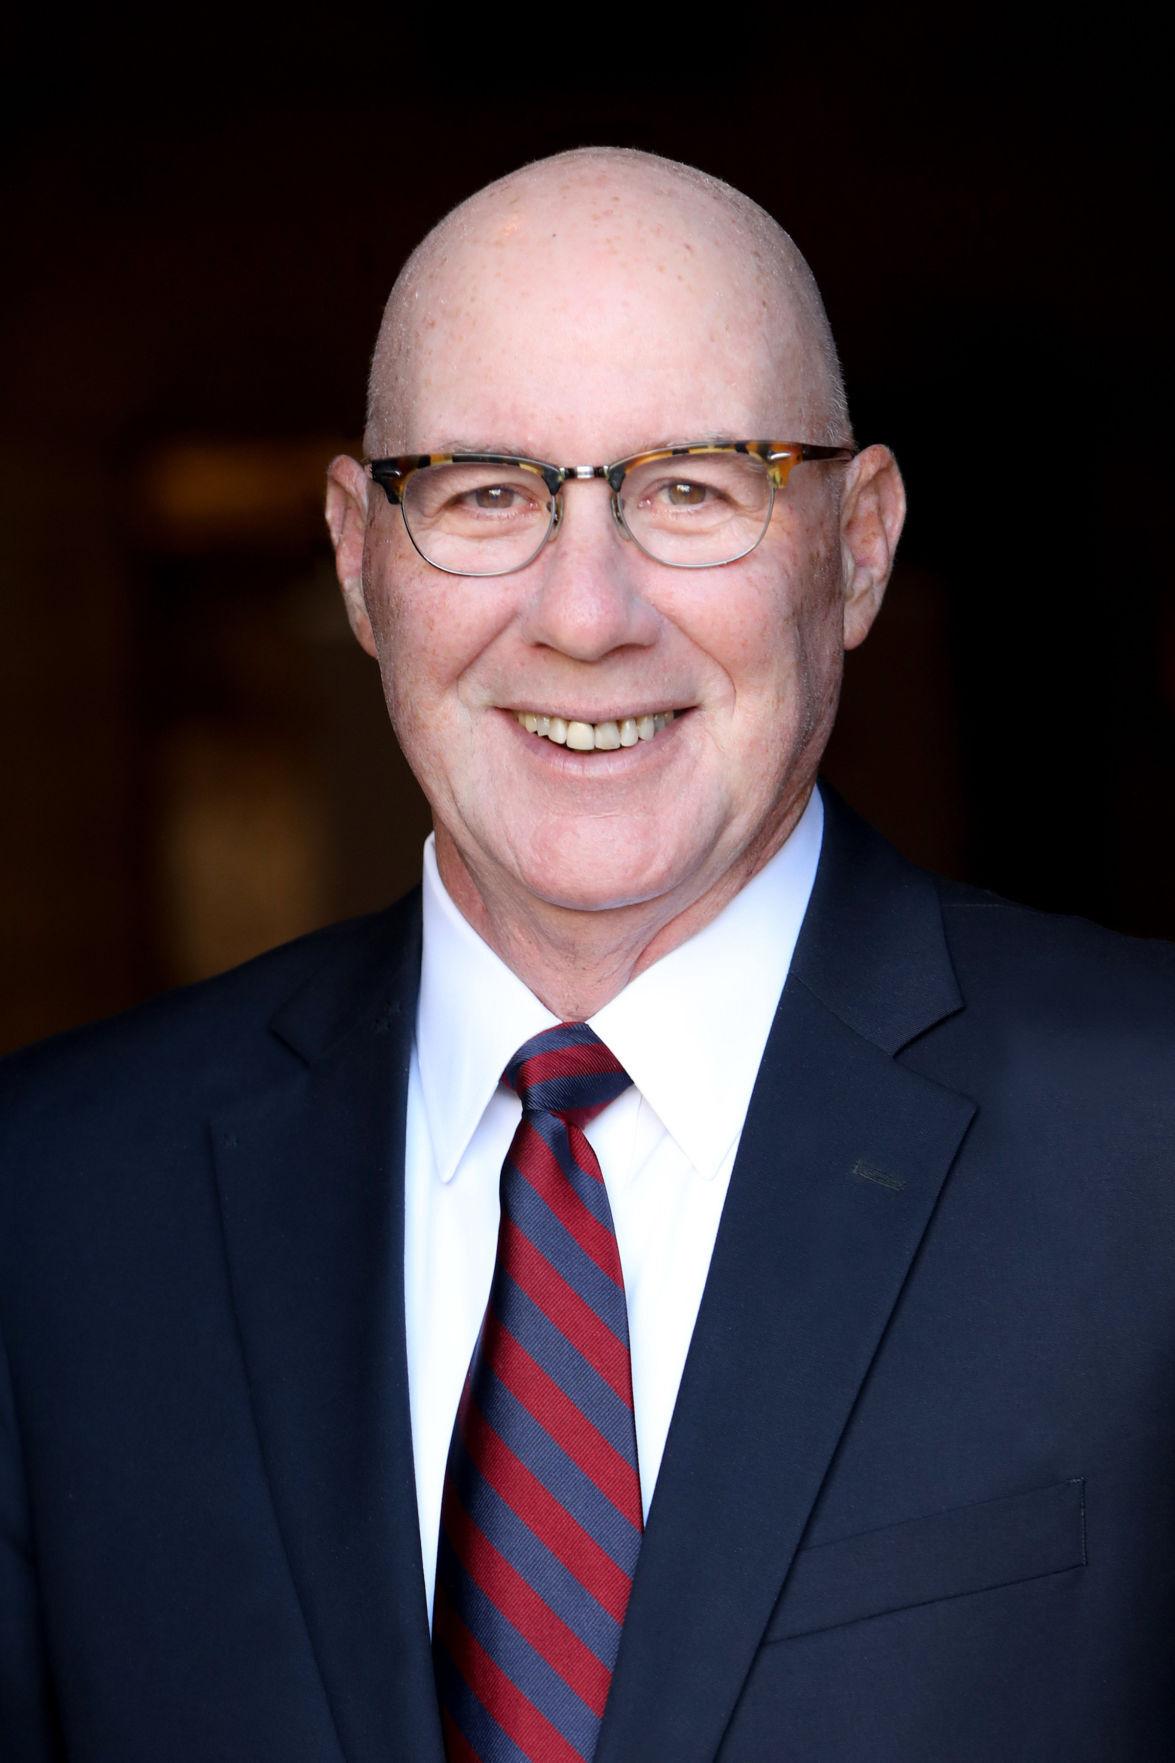 John Murray, Democratic candidate for Scranton City Controller i